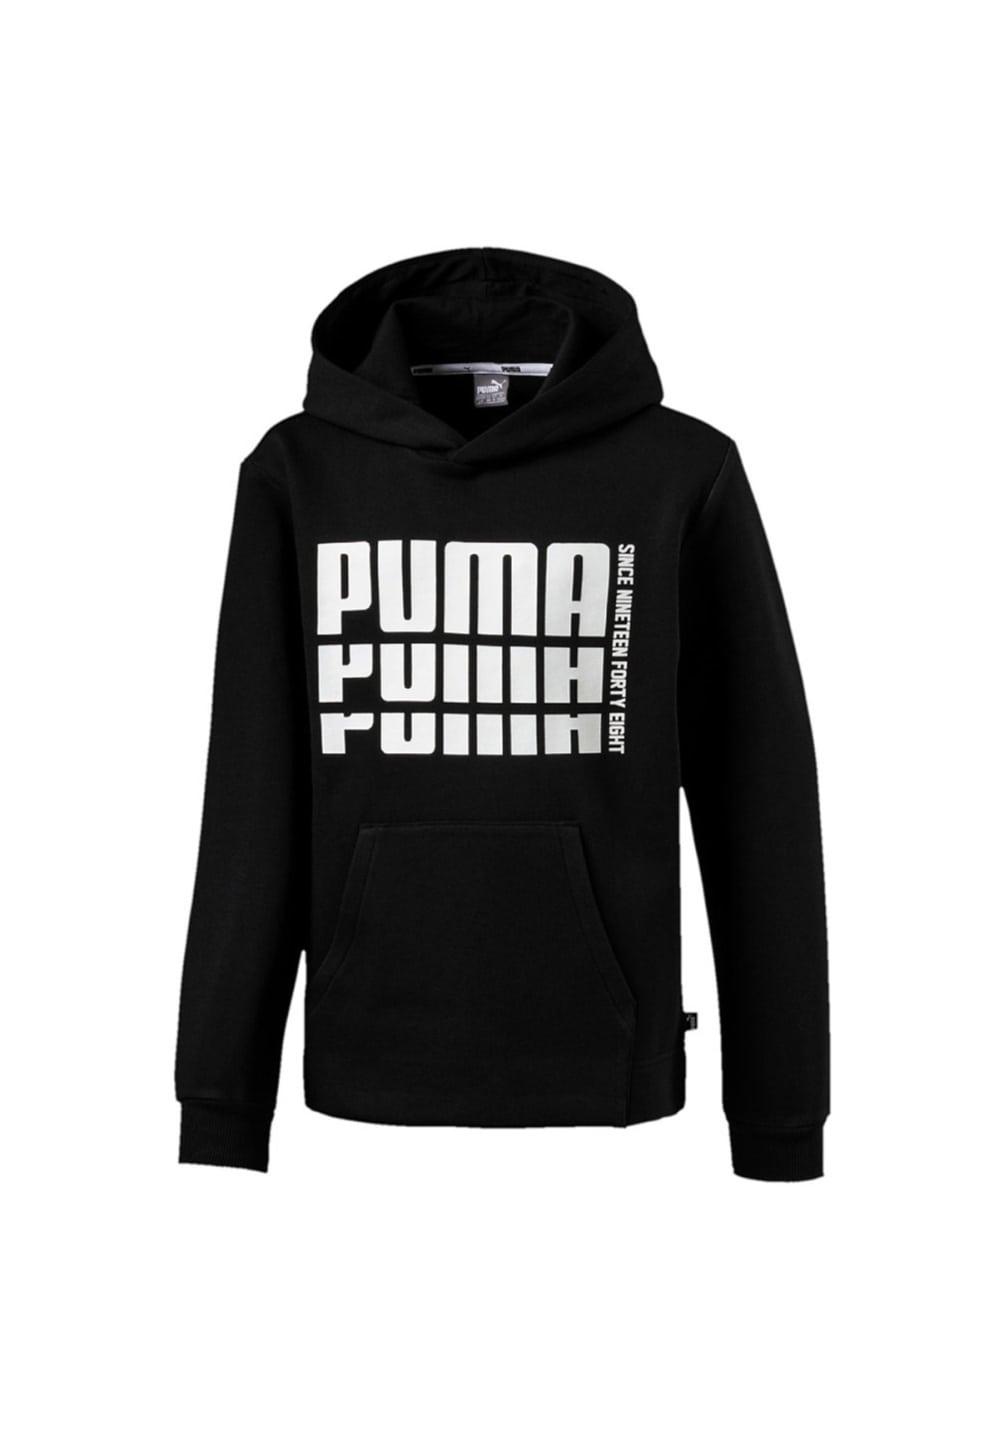 27ca73e526 Puma Rebel Bold Hoody FL Kids - Sweatshirts & Hoodies für Jungs ...